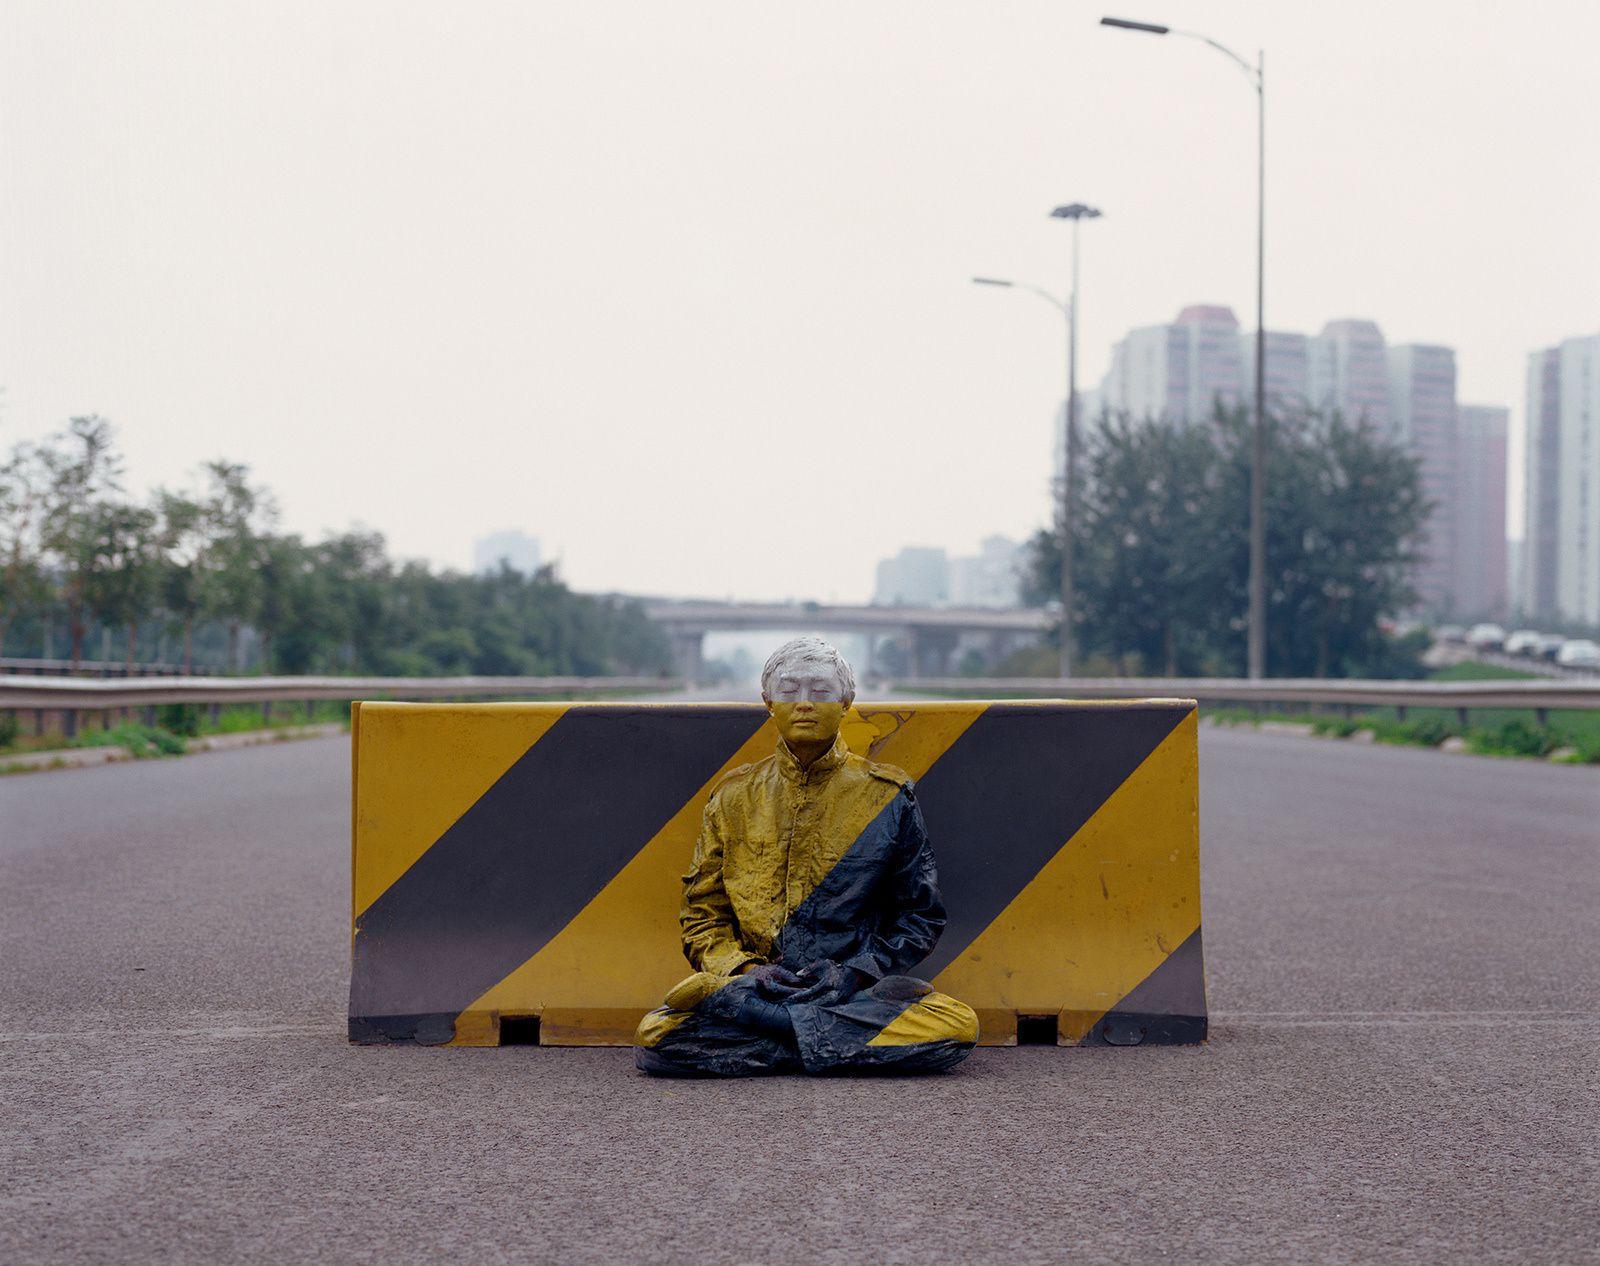 """Hiding in the City 51. Road Block"", 2007 de Liu BOLIN - Courtesy de l'Artiste et Galerie Paris Beijing"